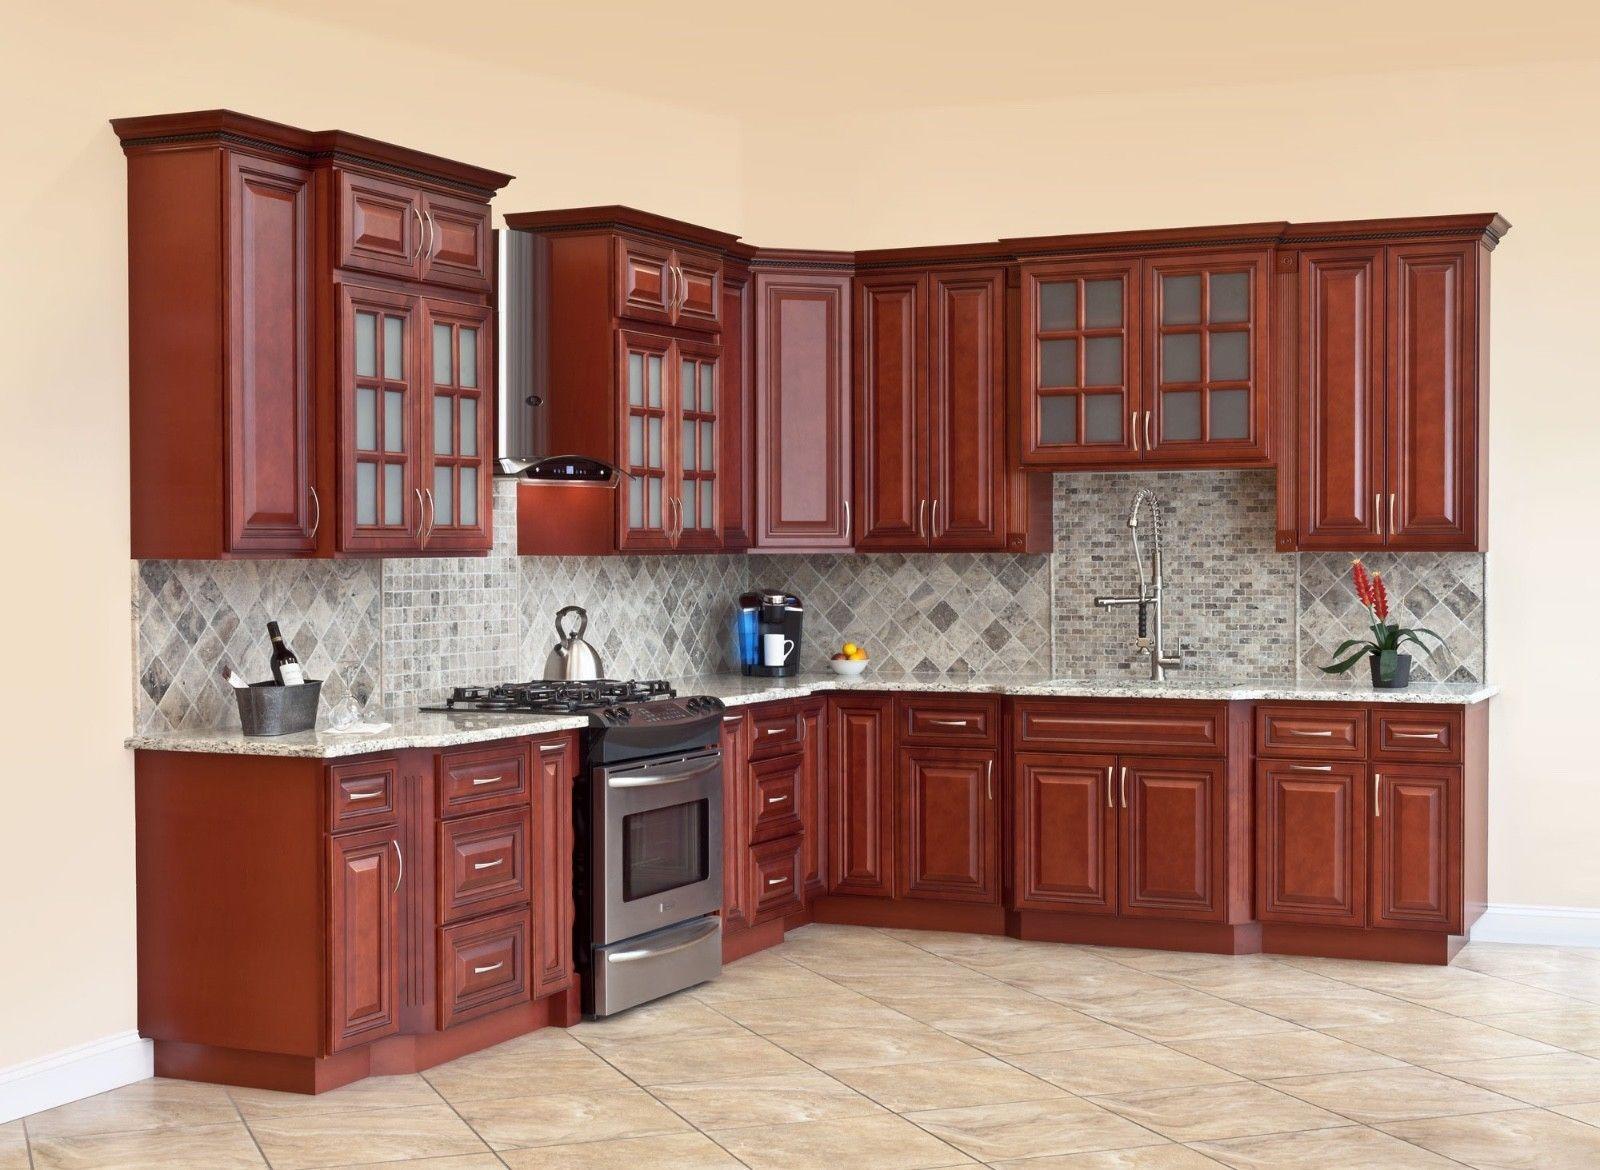 10x10 All Solid Wood Kitchen Cabinets Cherryville Rta 816124022480